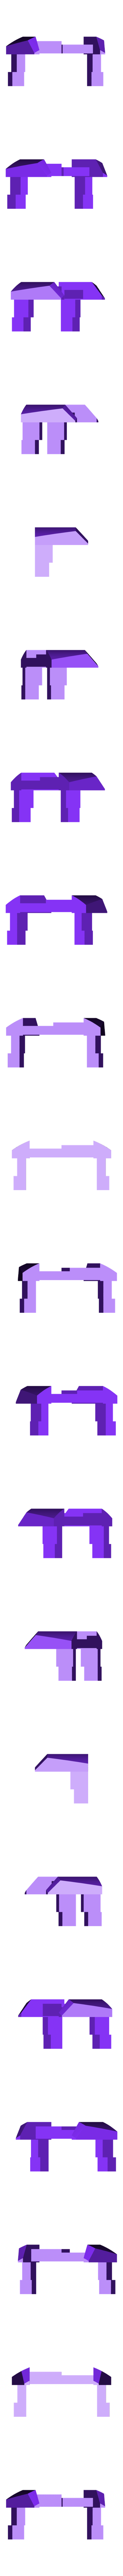 Skelton_Teeth.stl Download free STL file Halloween Glow in the dark wall/door hanger (Skelton) • 3D print object, Pongo